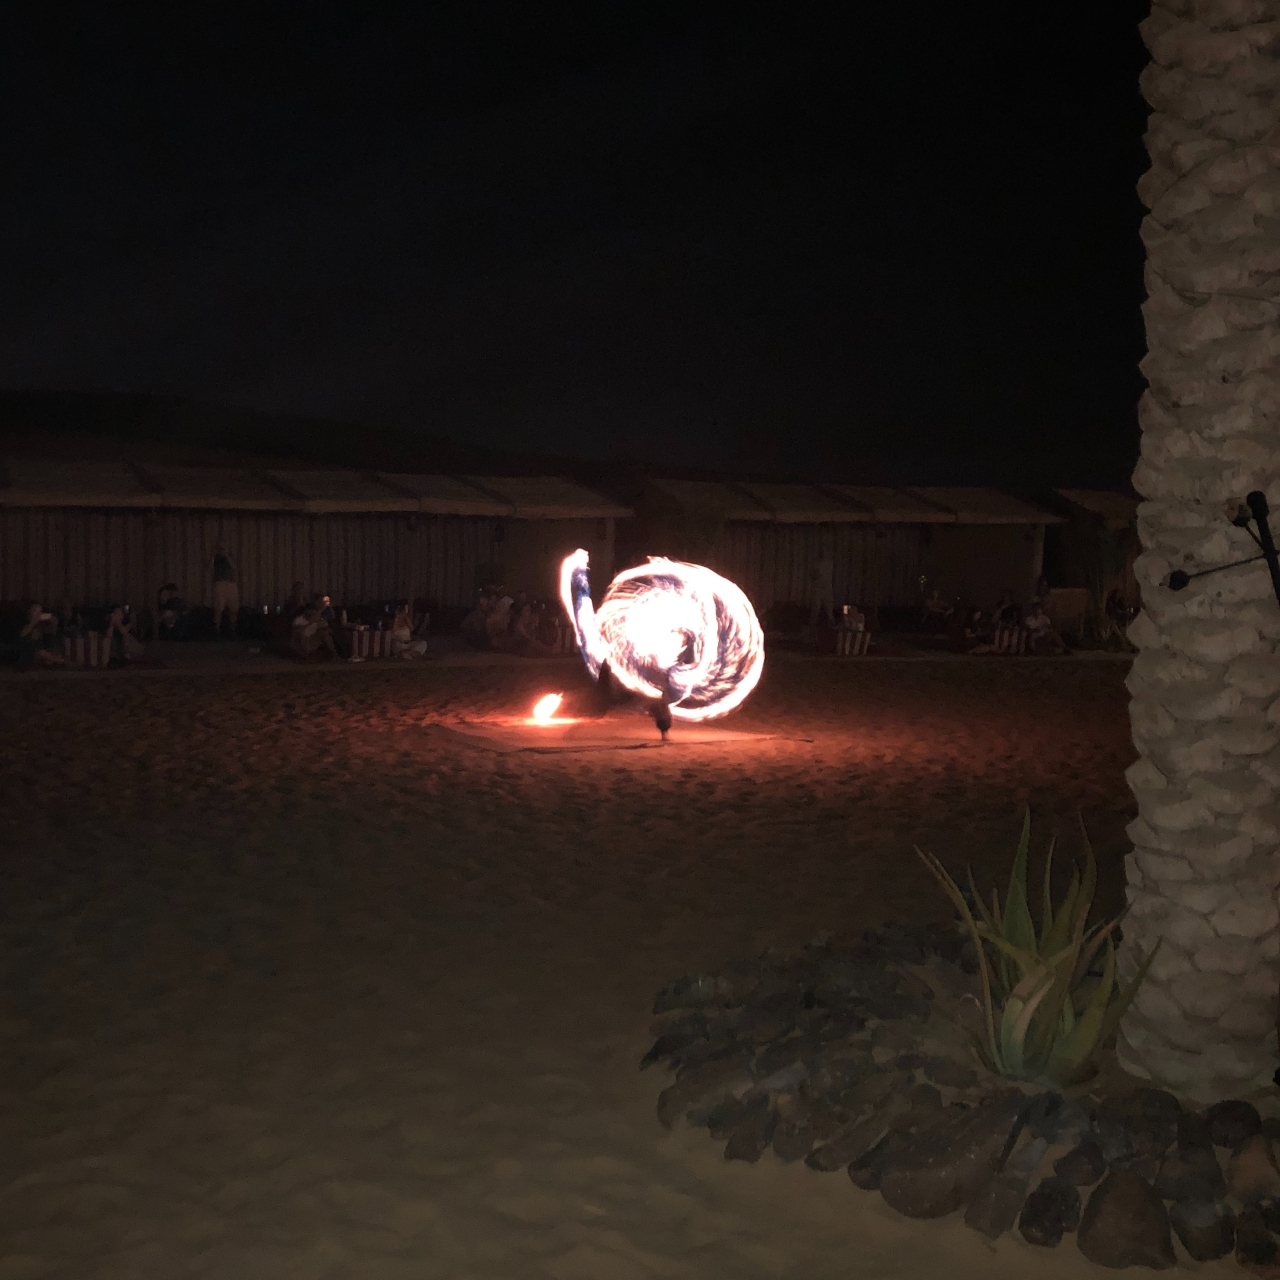 Fire dancer Dubai desert